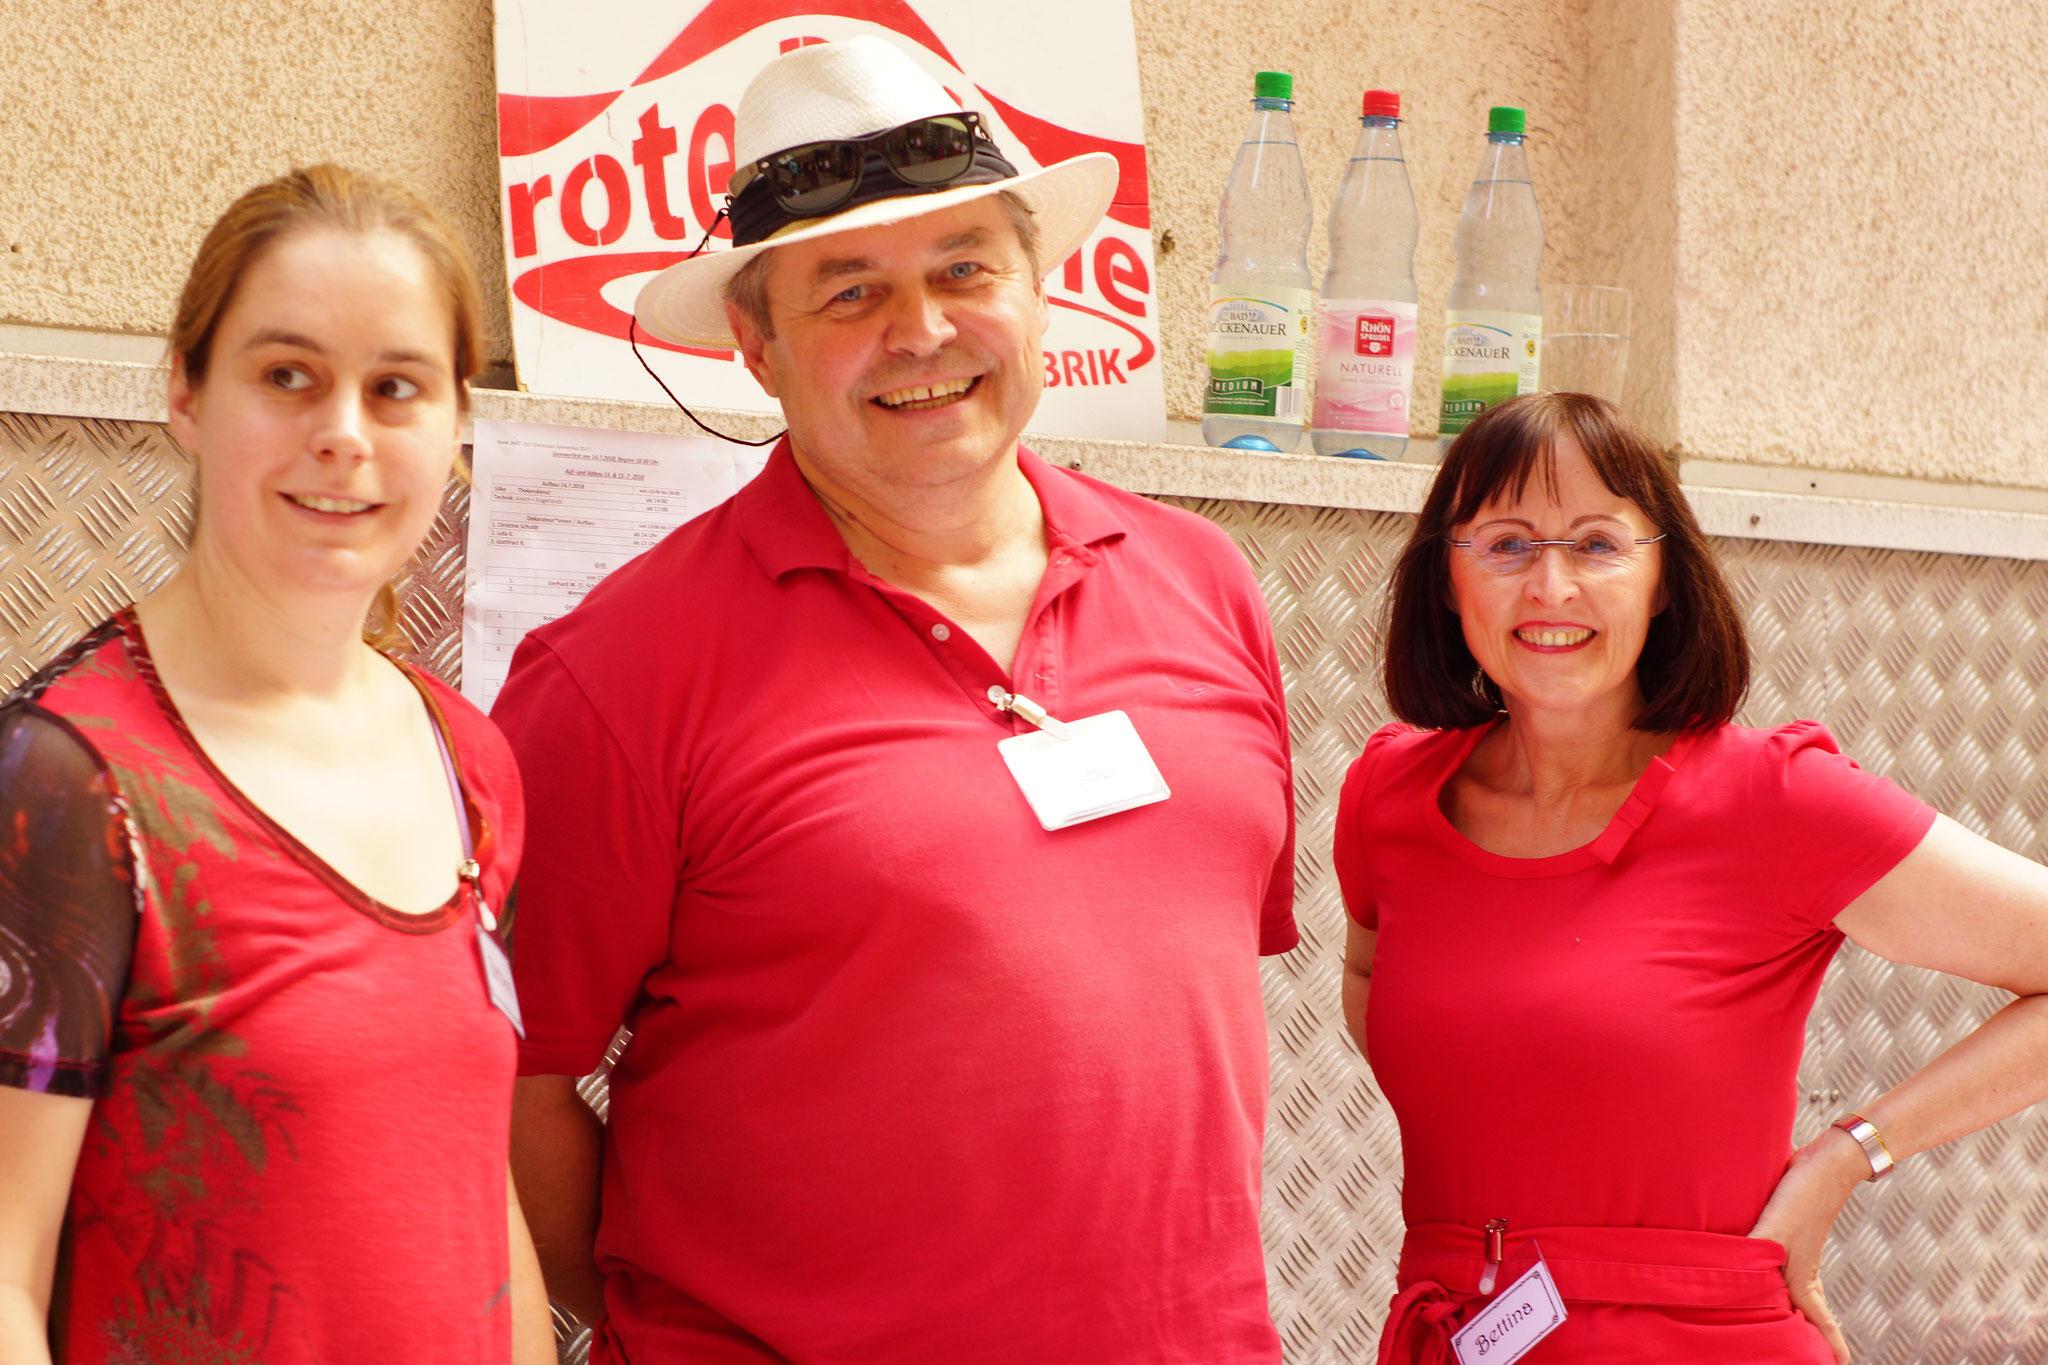 Unsere Ehrenamtlichen Helfer - Vielen Dank an Barbara, Robert & Bettina